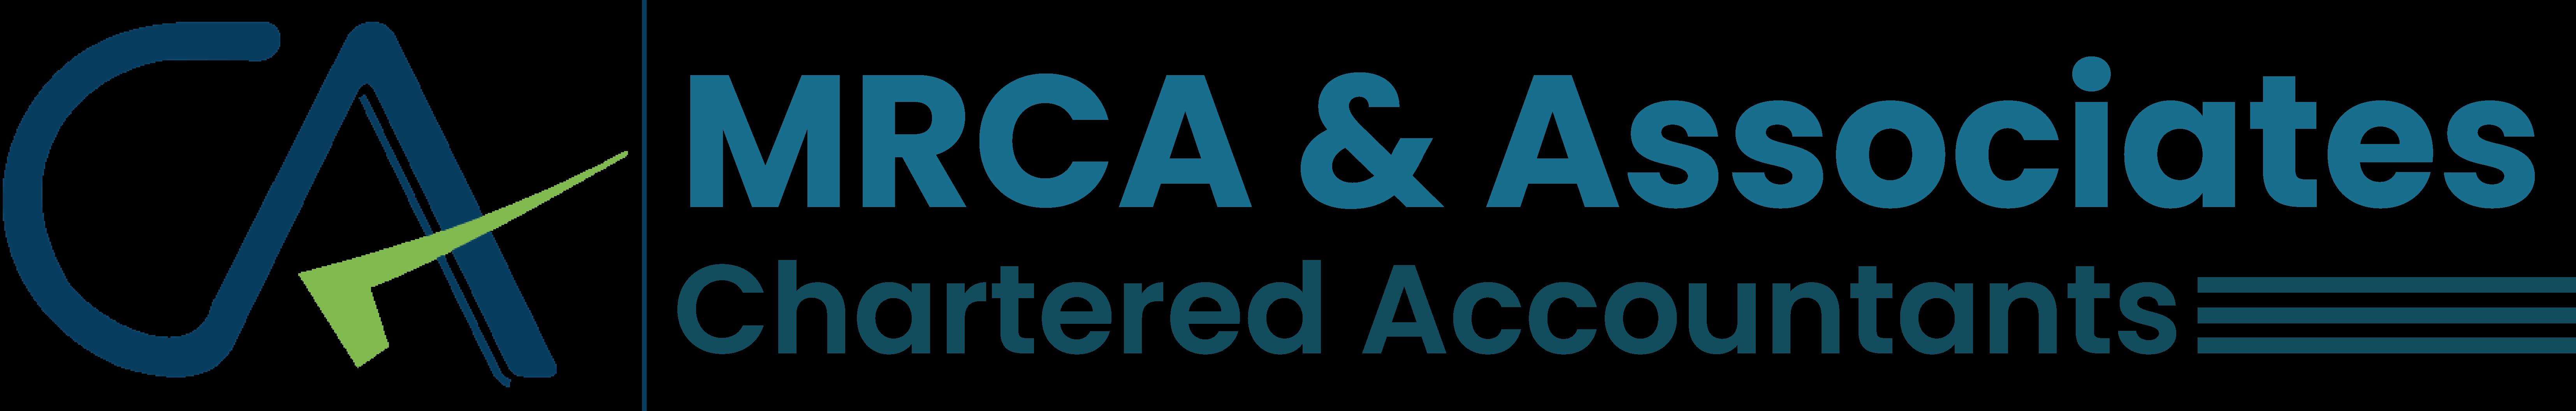 MRCA & Associates